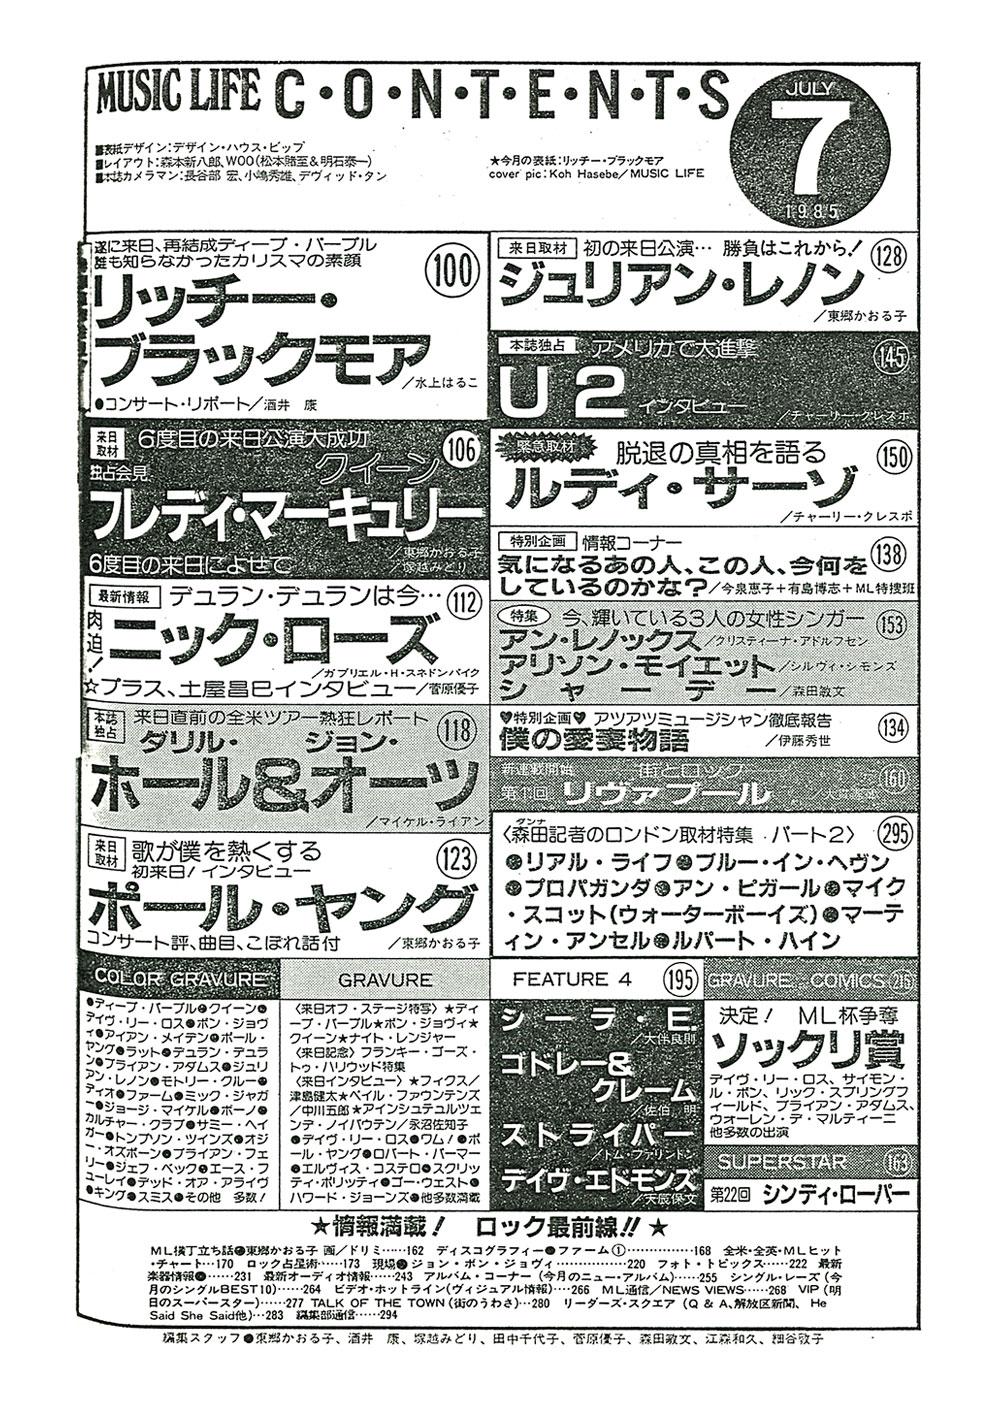 MUSIC LIFE 1985年7月号目次